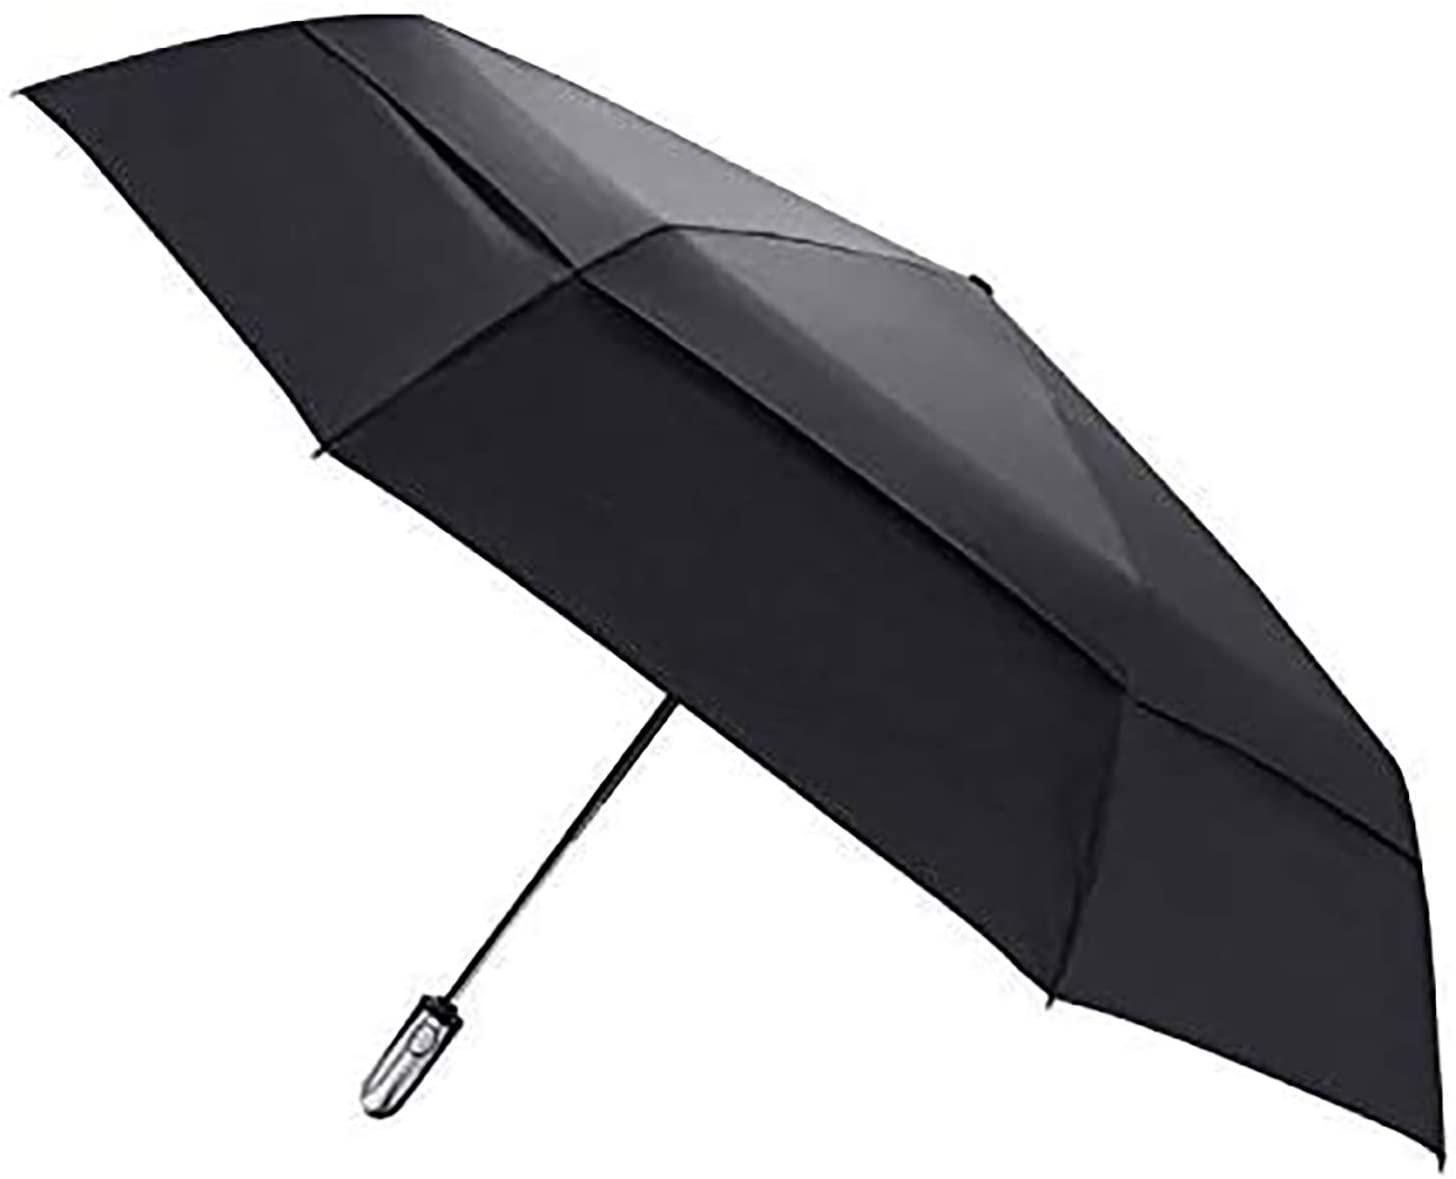 boy 54 Inch Large Golf Umbrella - Vented Windproof Double Canopy Auto Open Close Folding Golf Umbrella, 210T Dupont Teflon Coating